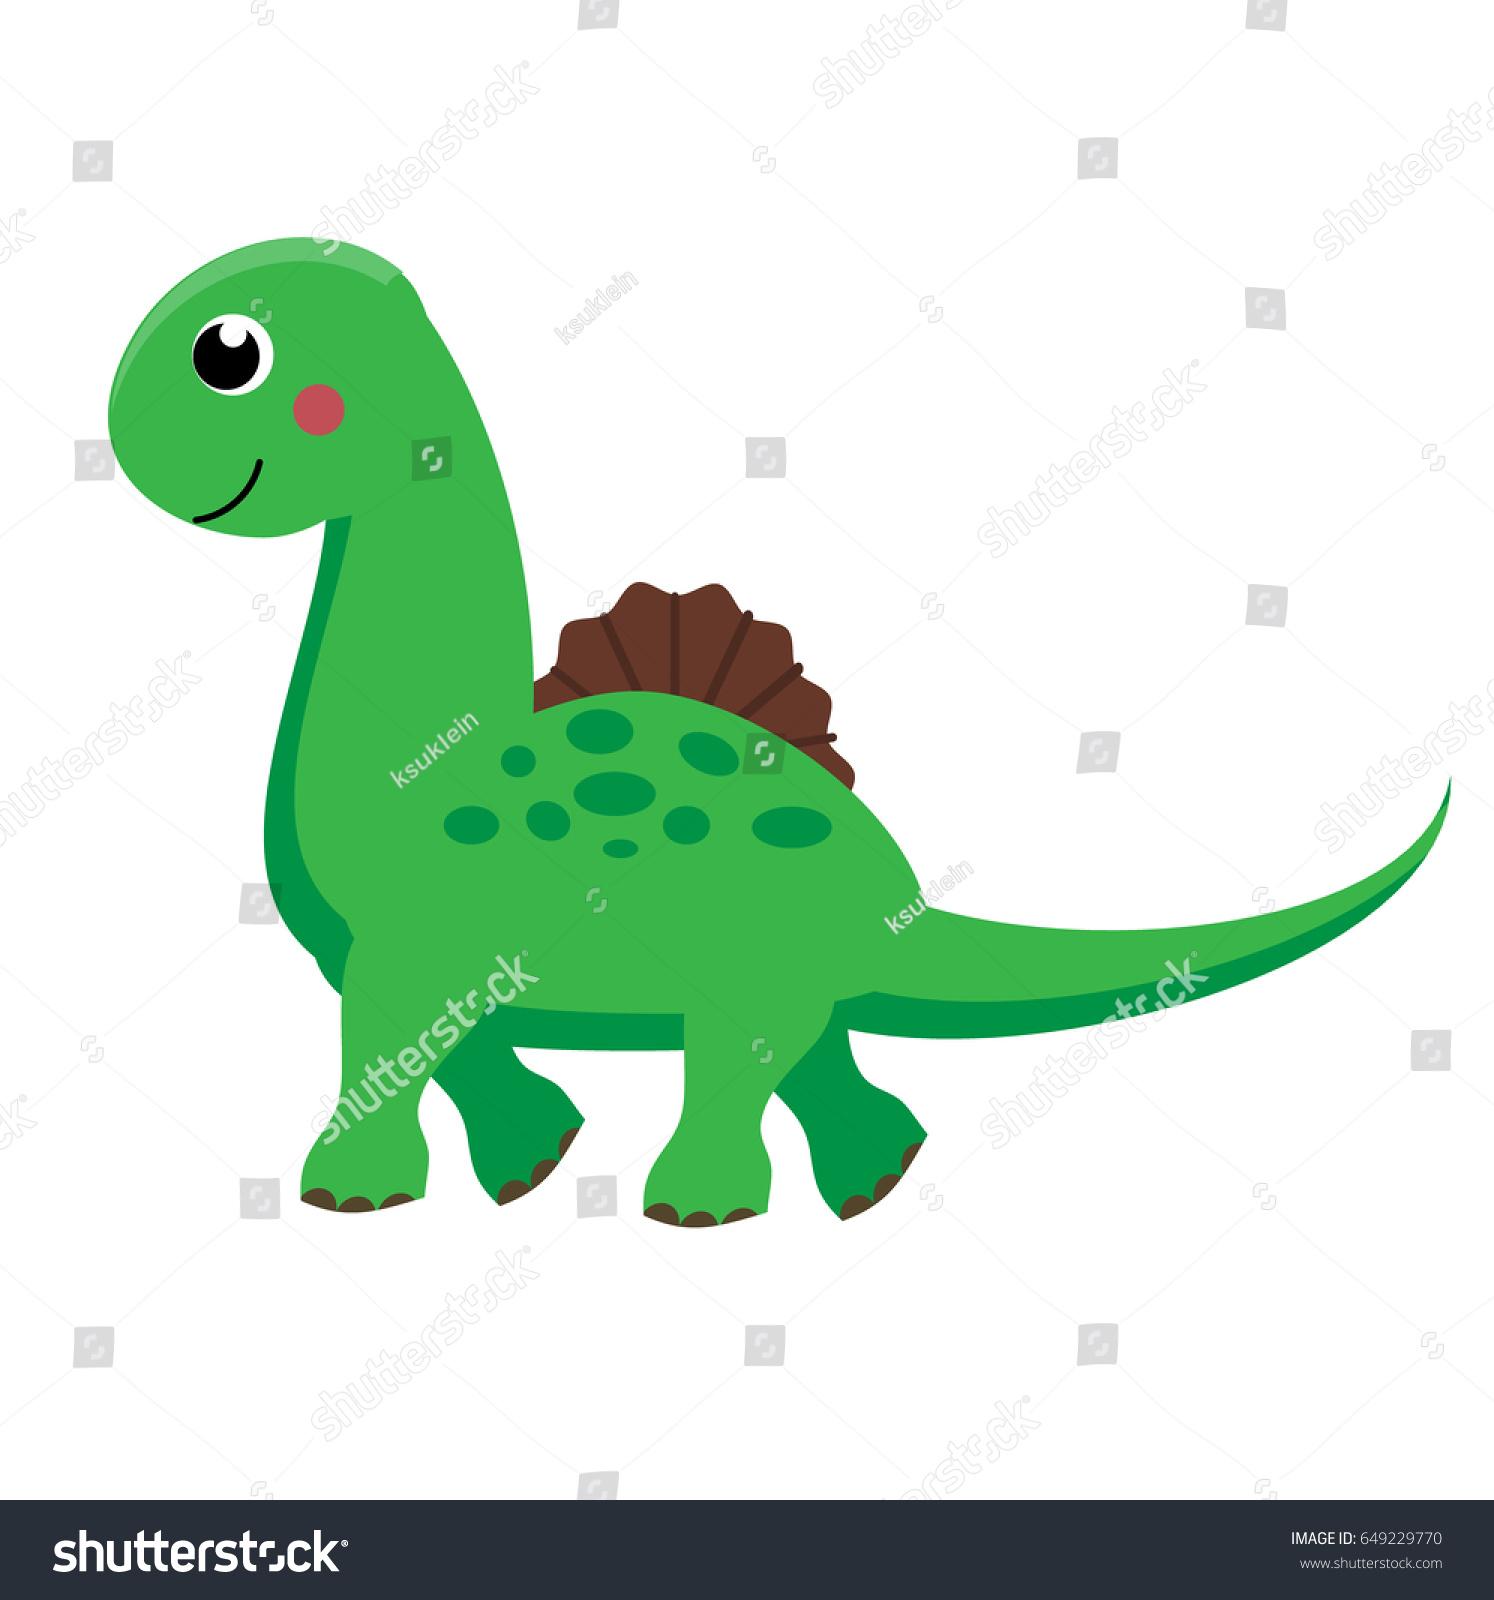 Cute Green Dinosaur Cartoon Dino Character Stock Vector 649229770 ...